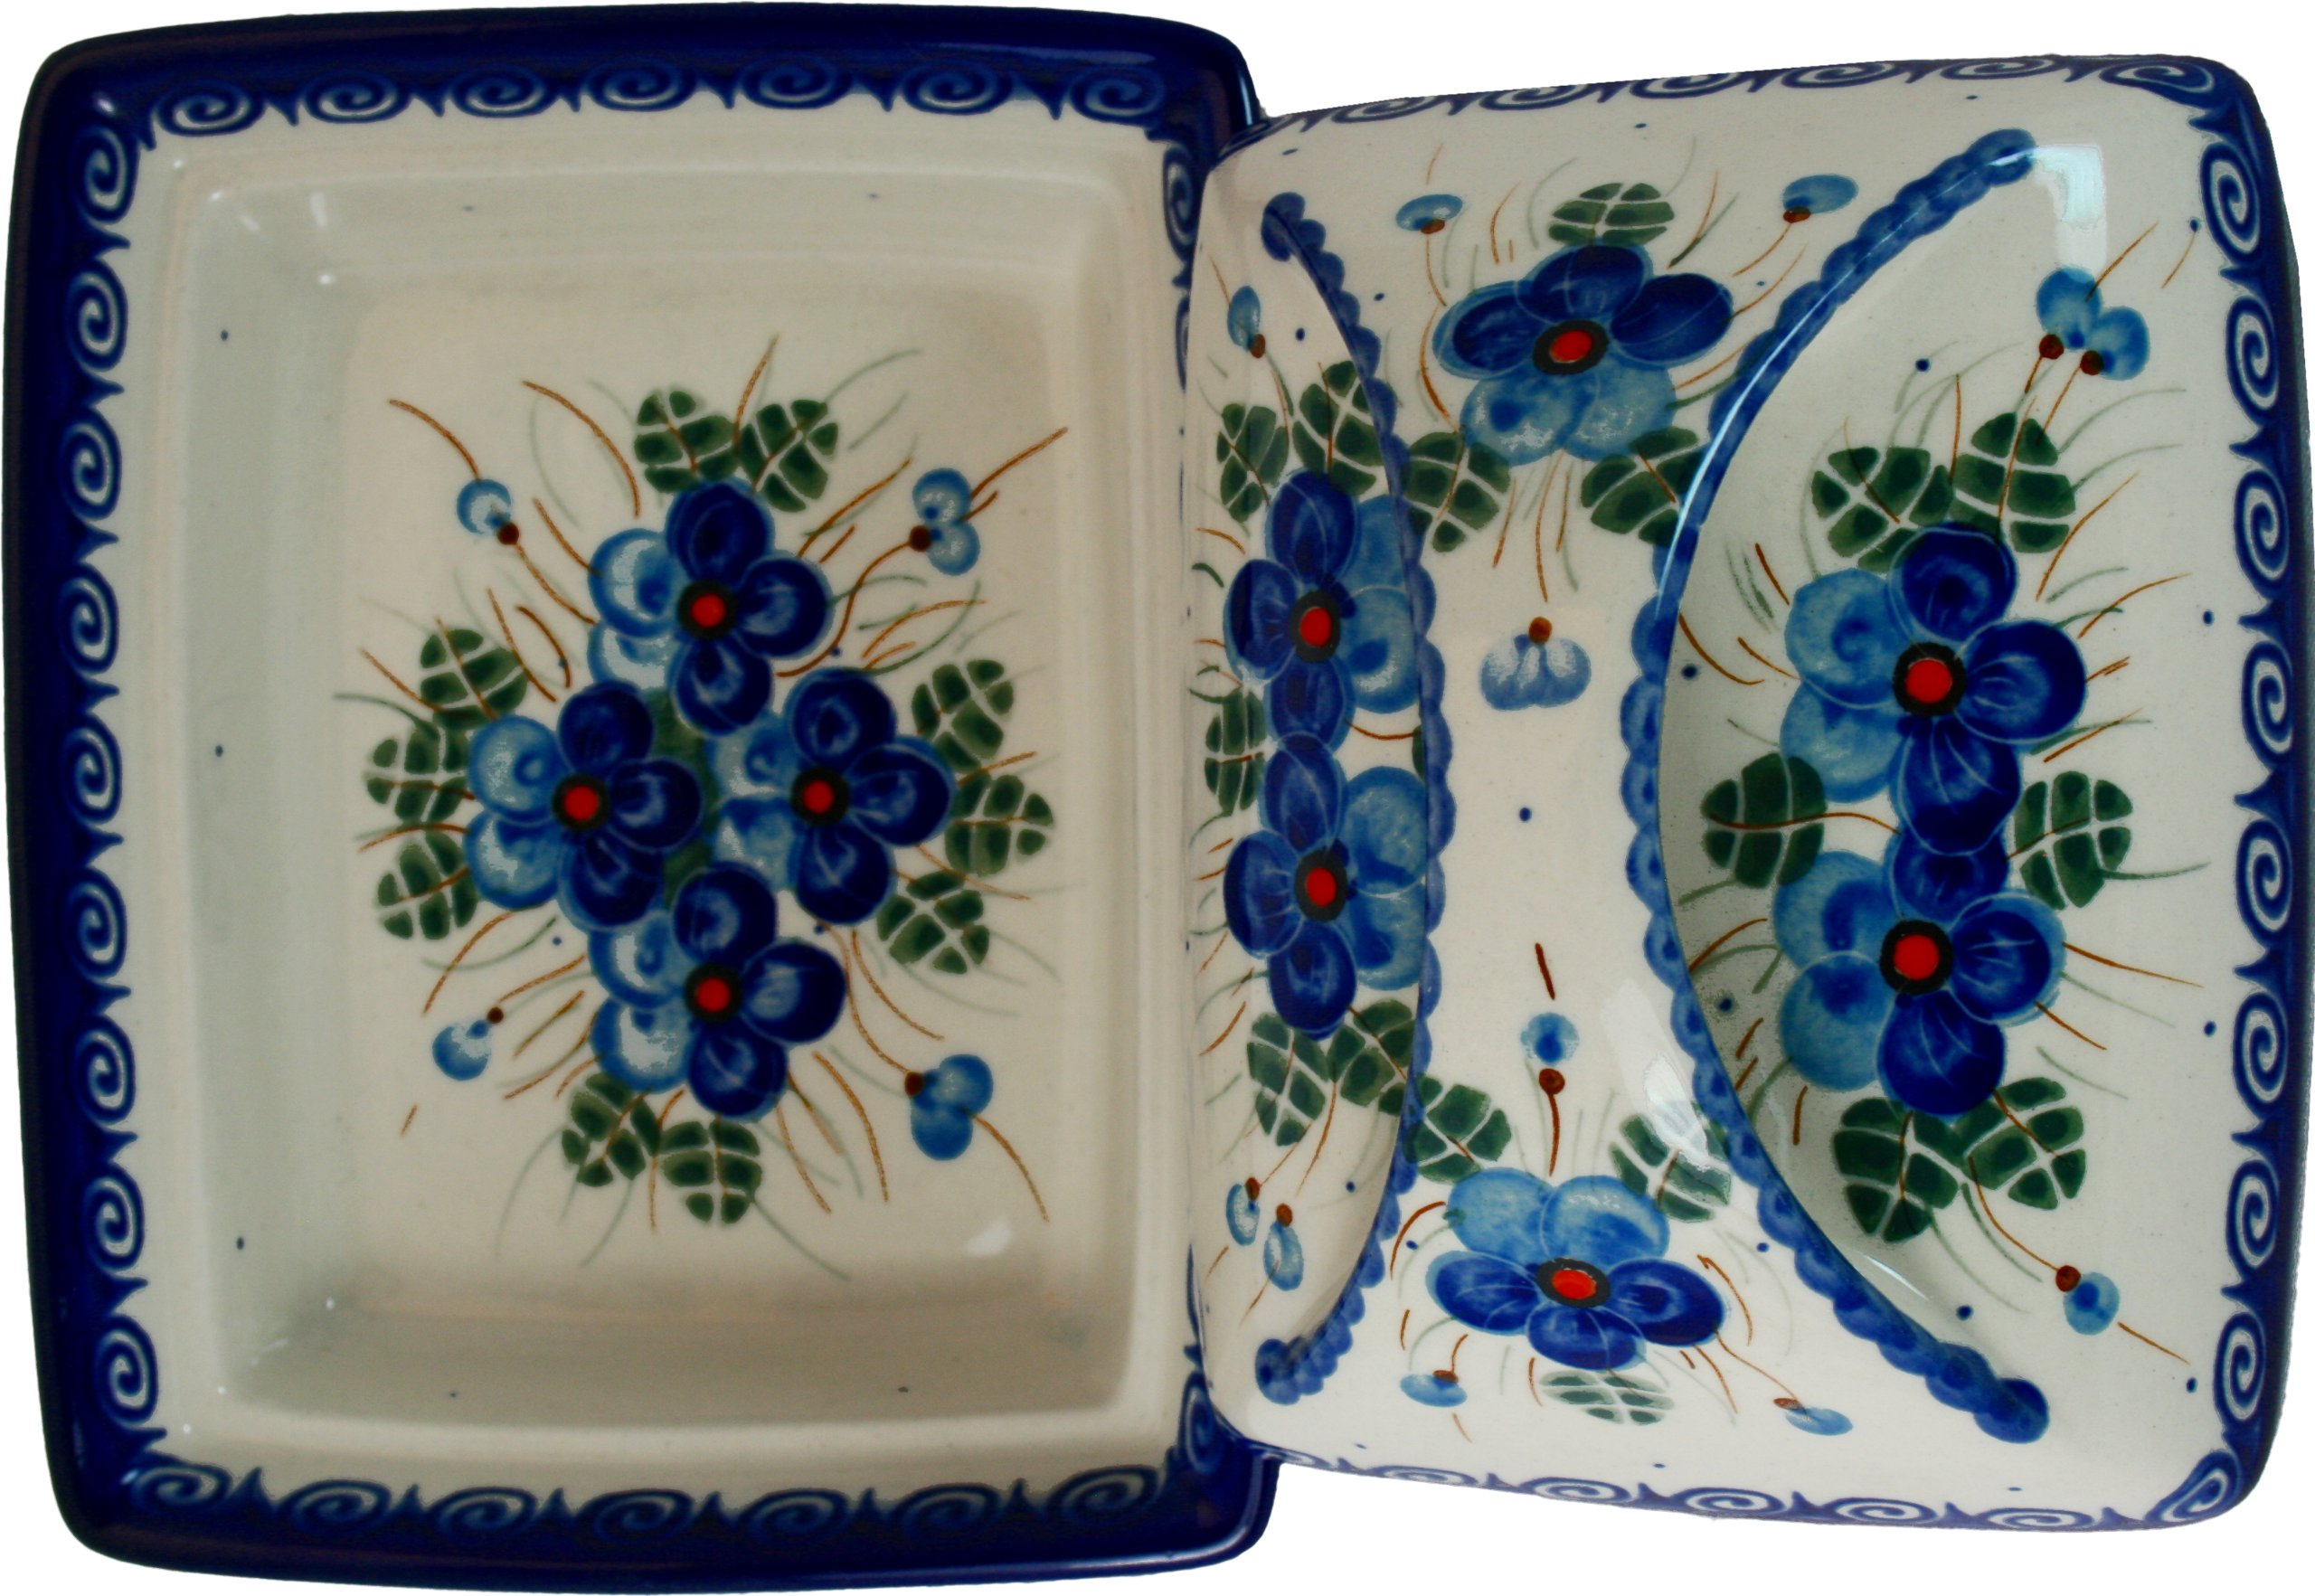 Polish Pottery Ceramika Boleslawiec, 0352/162, Butter Dish Deep, 2 Cubes, Royal Blue Patterns with Blue Pansy Flower Motif by Polish Pottery Ceramika Boleslawiec (Image #2)